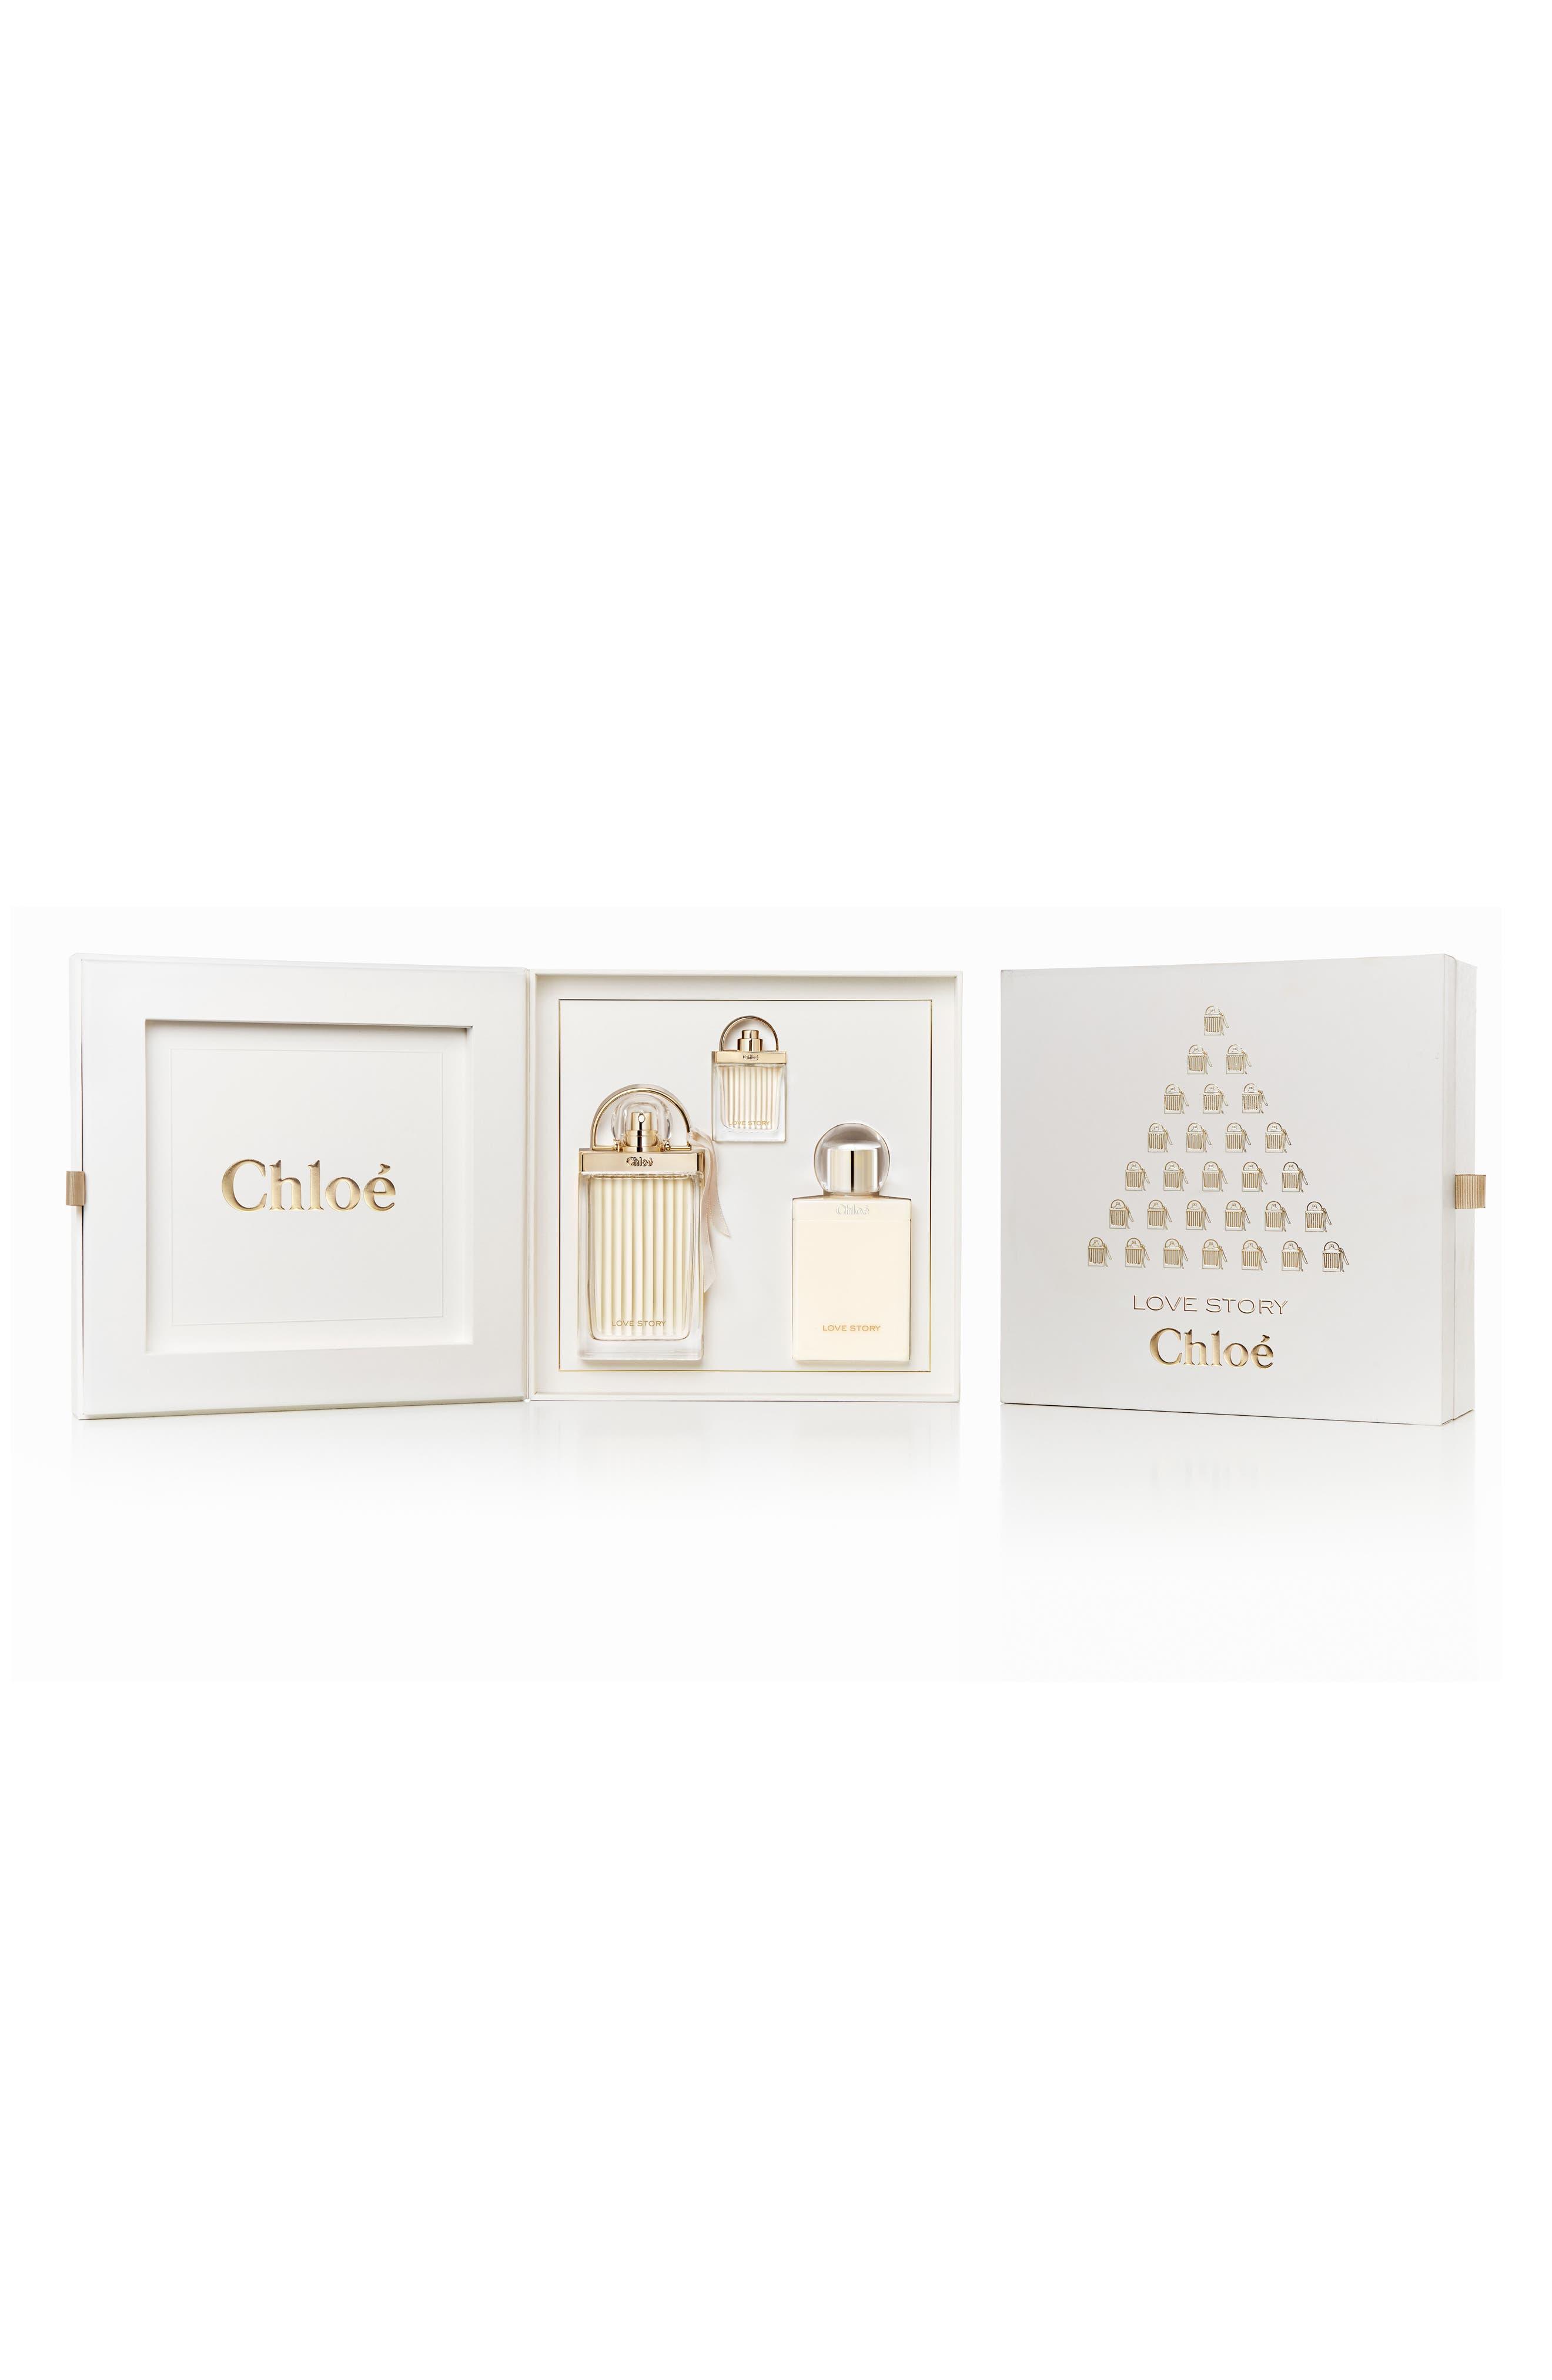 Chloé Love Story Set ($165 Value)